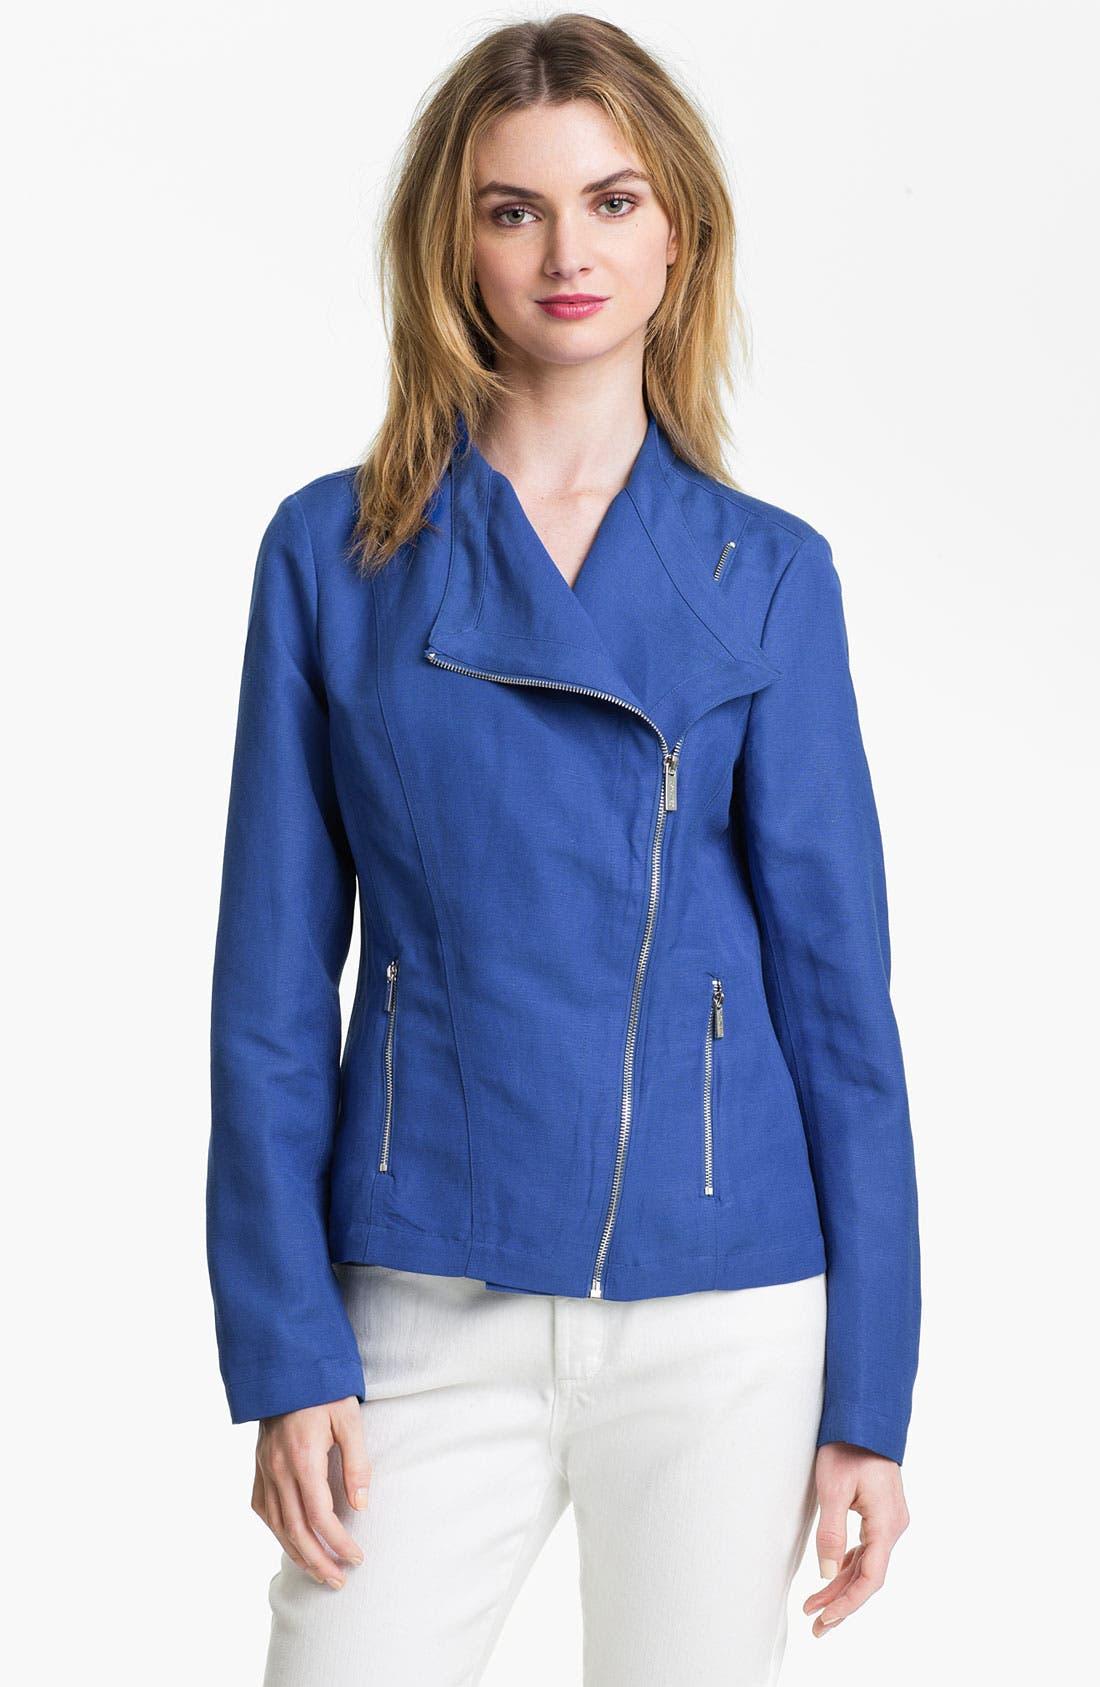 Alternate Image 1 Selected - Calvin Klein Linen Blend Moto Jacket (Online Exclusive)